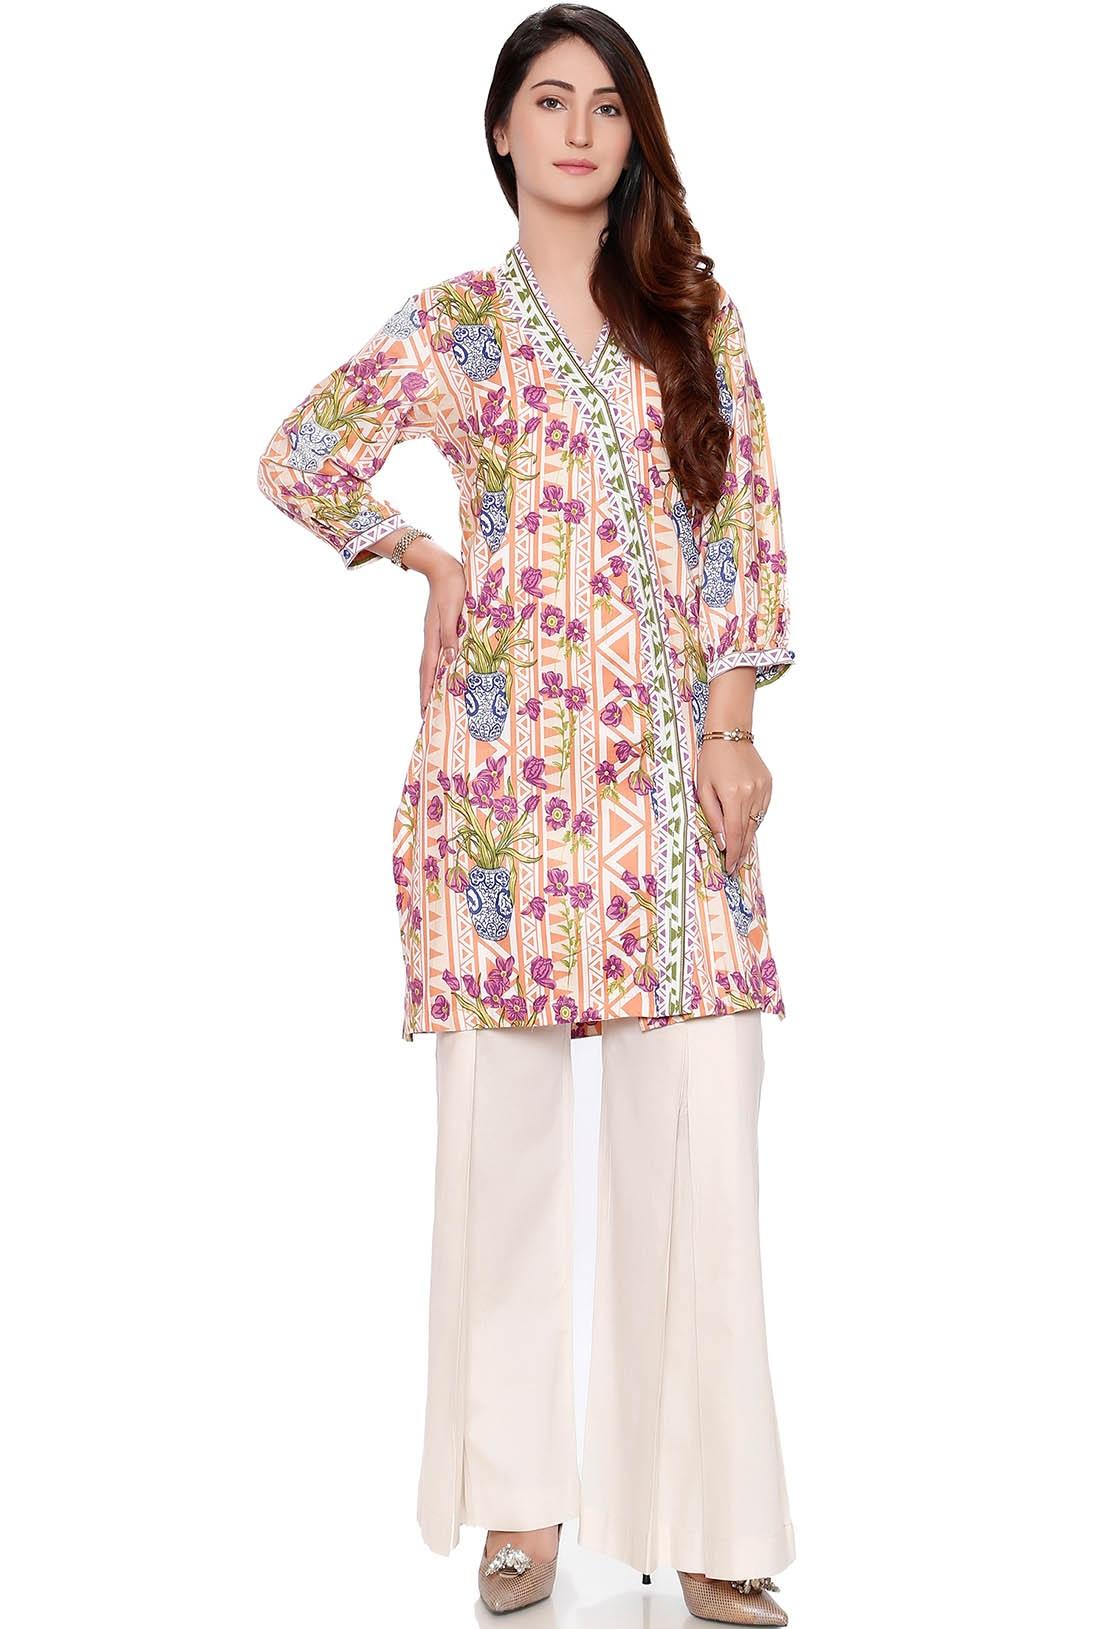 Warda winter linen shirt with bell-bottom pant